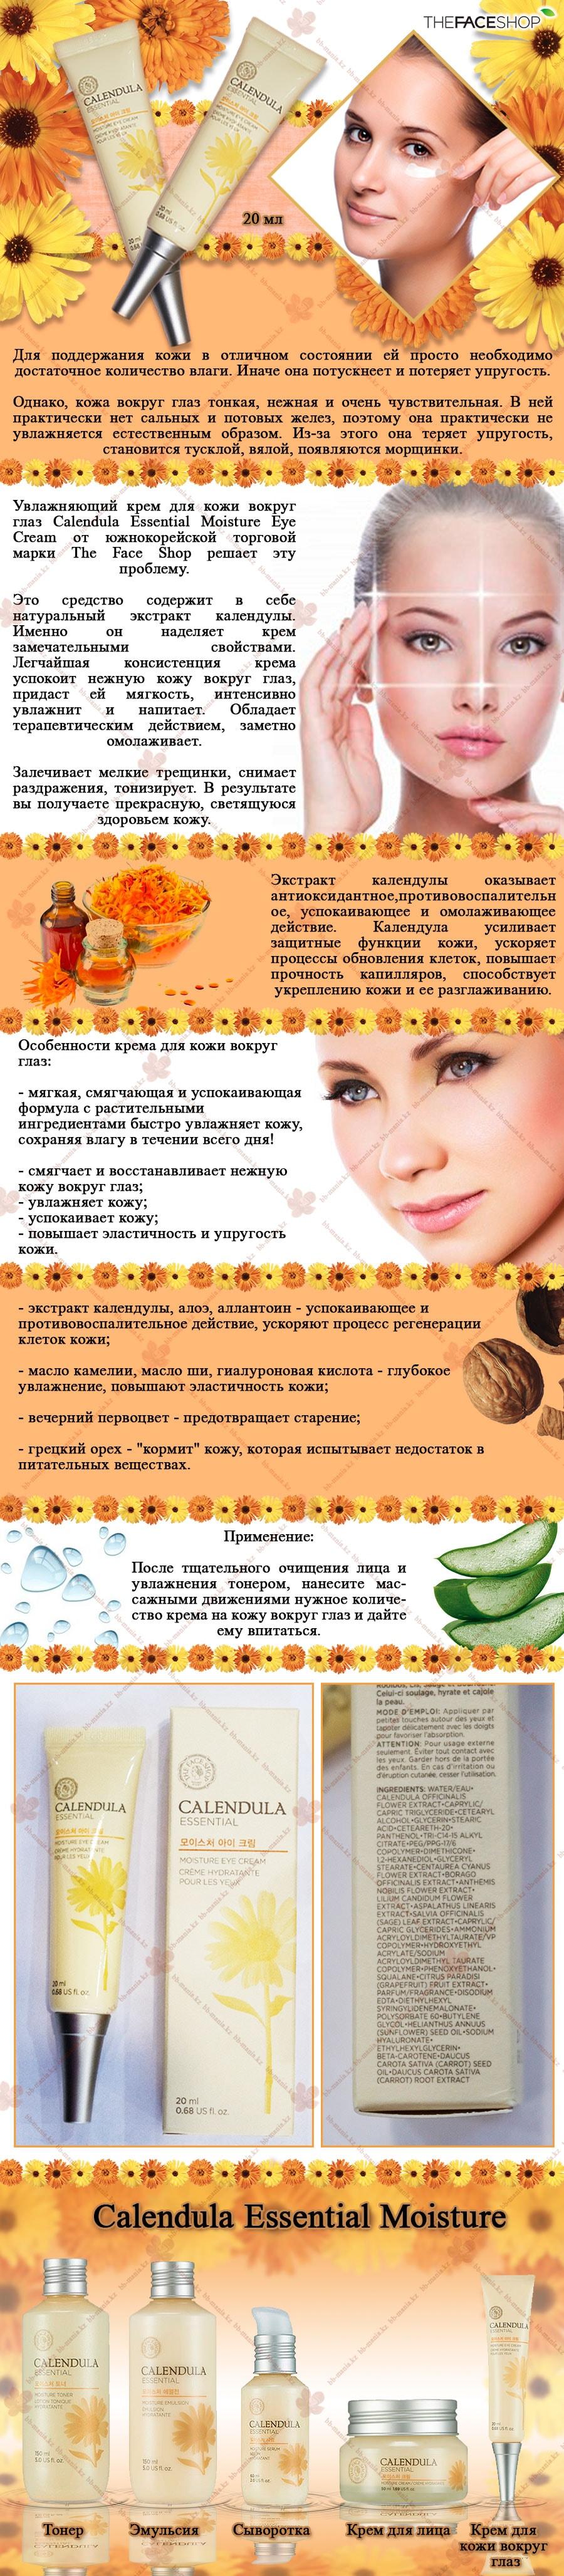 Calendula-Essential-Moisture-Eye-Cream-[The-Face-Shop]-min